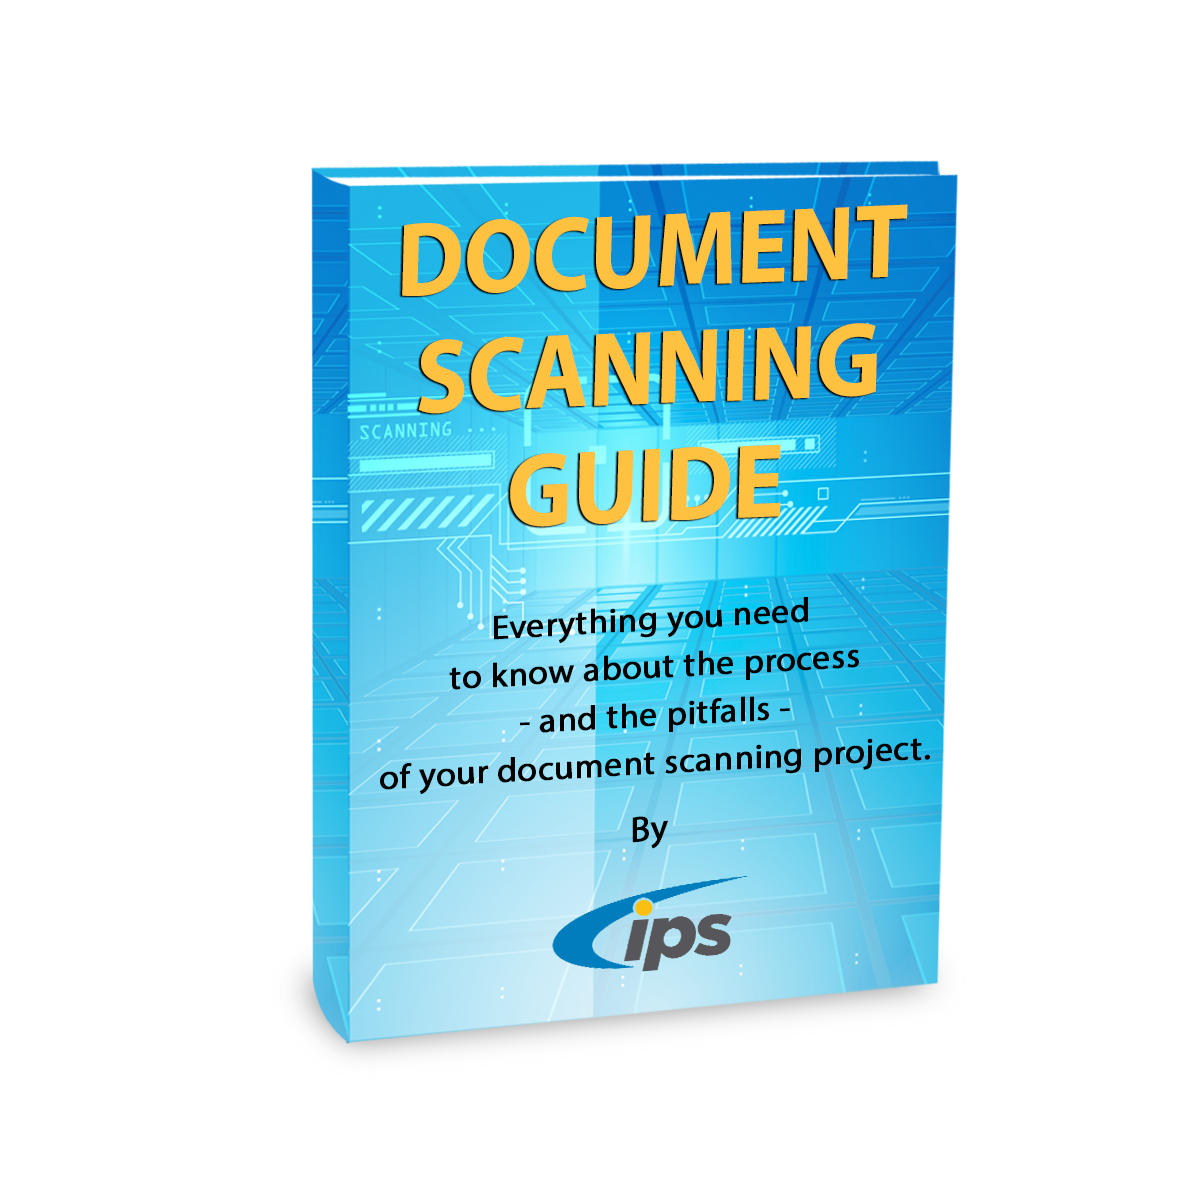 IPS-Doc-Scanning-Guide-cover v2.png